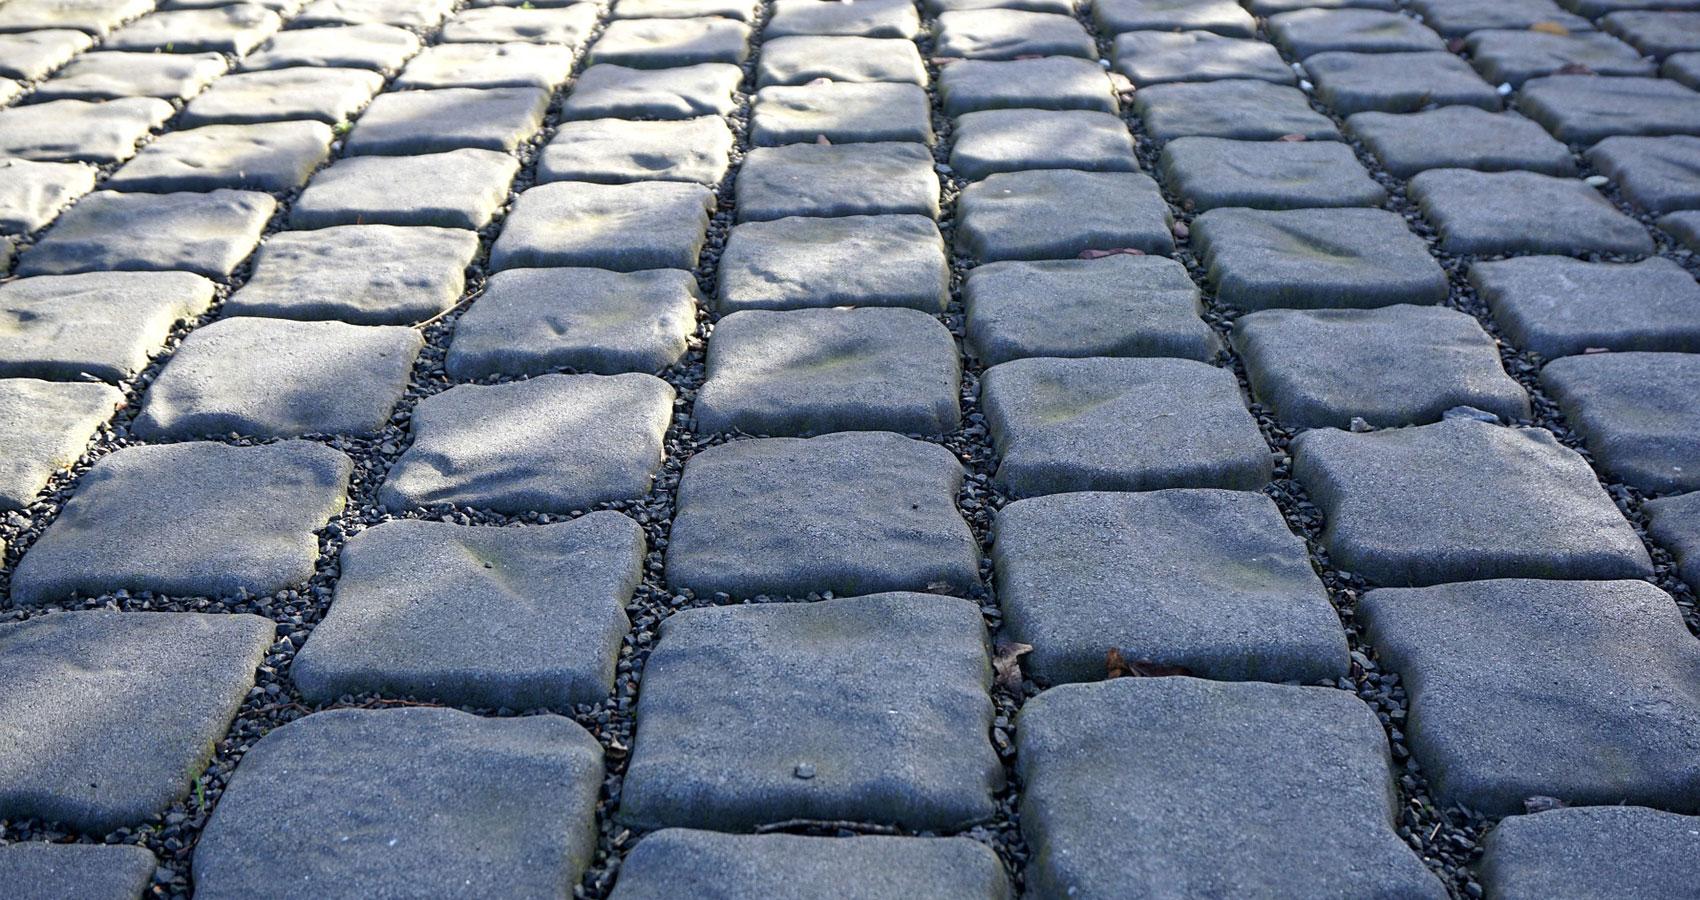 atch Of Stones by Peter McCann Ashtonat Spillwords.com